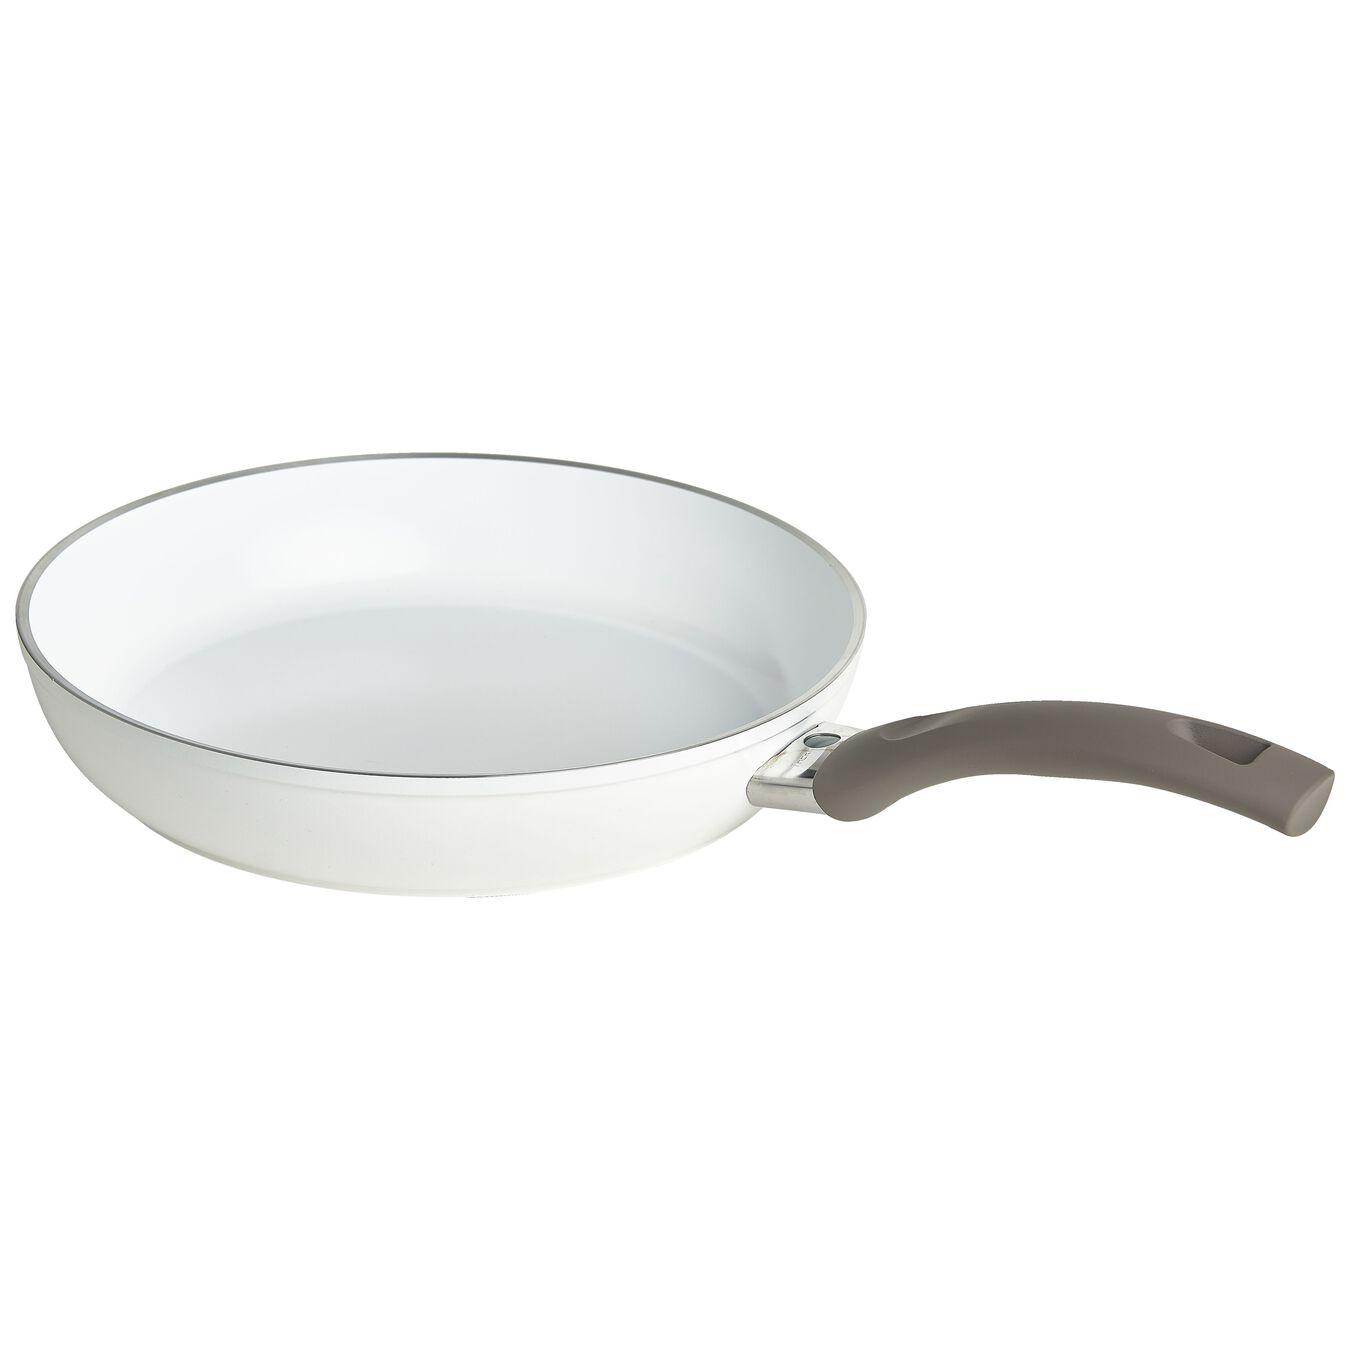 Bratpfanne flach 24 cm, Aluminium, Weiß,,large 1